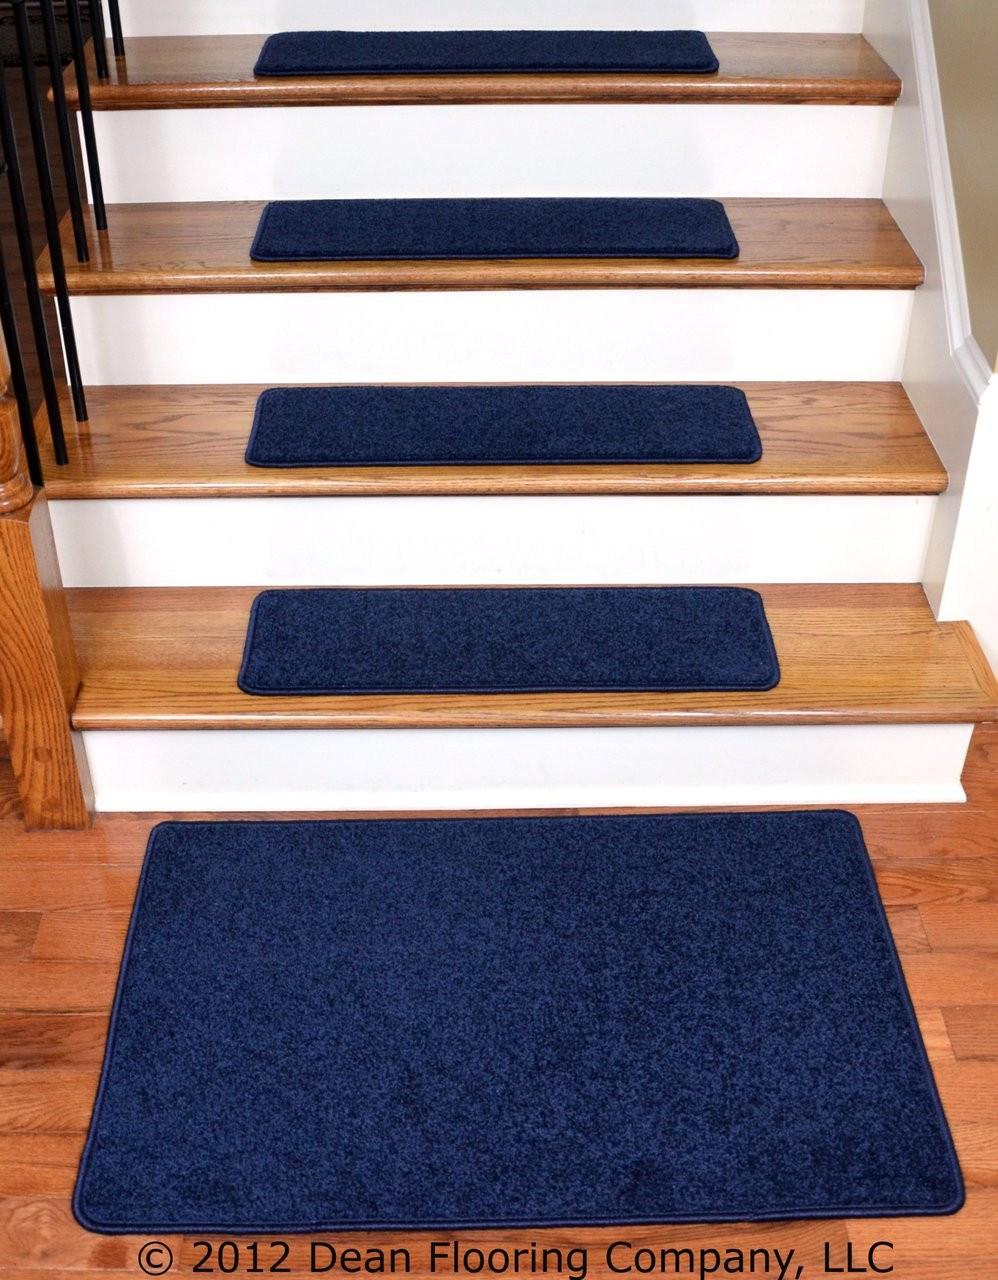 Dean Carpet Stair Treads 27 X 9 Navy Blue Plush 13 Plus A 2   Thick Carpet Stair Treads   Non Slip   Cut Pile   Bullnose Carpet   Slip Resistant   Flooring